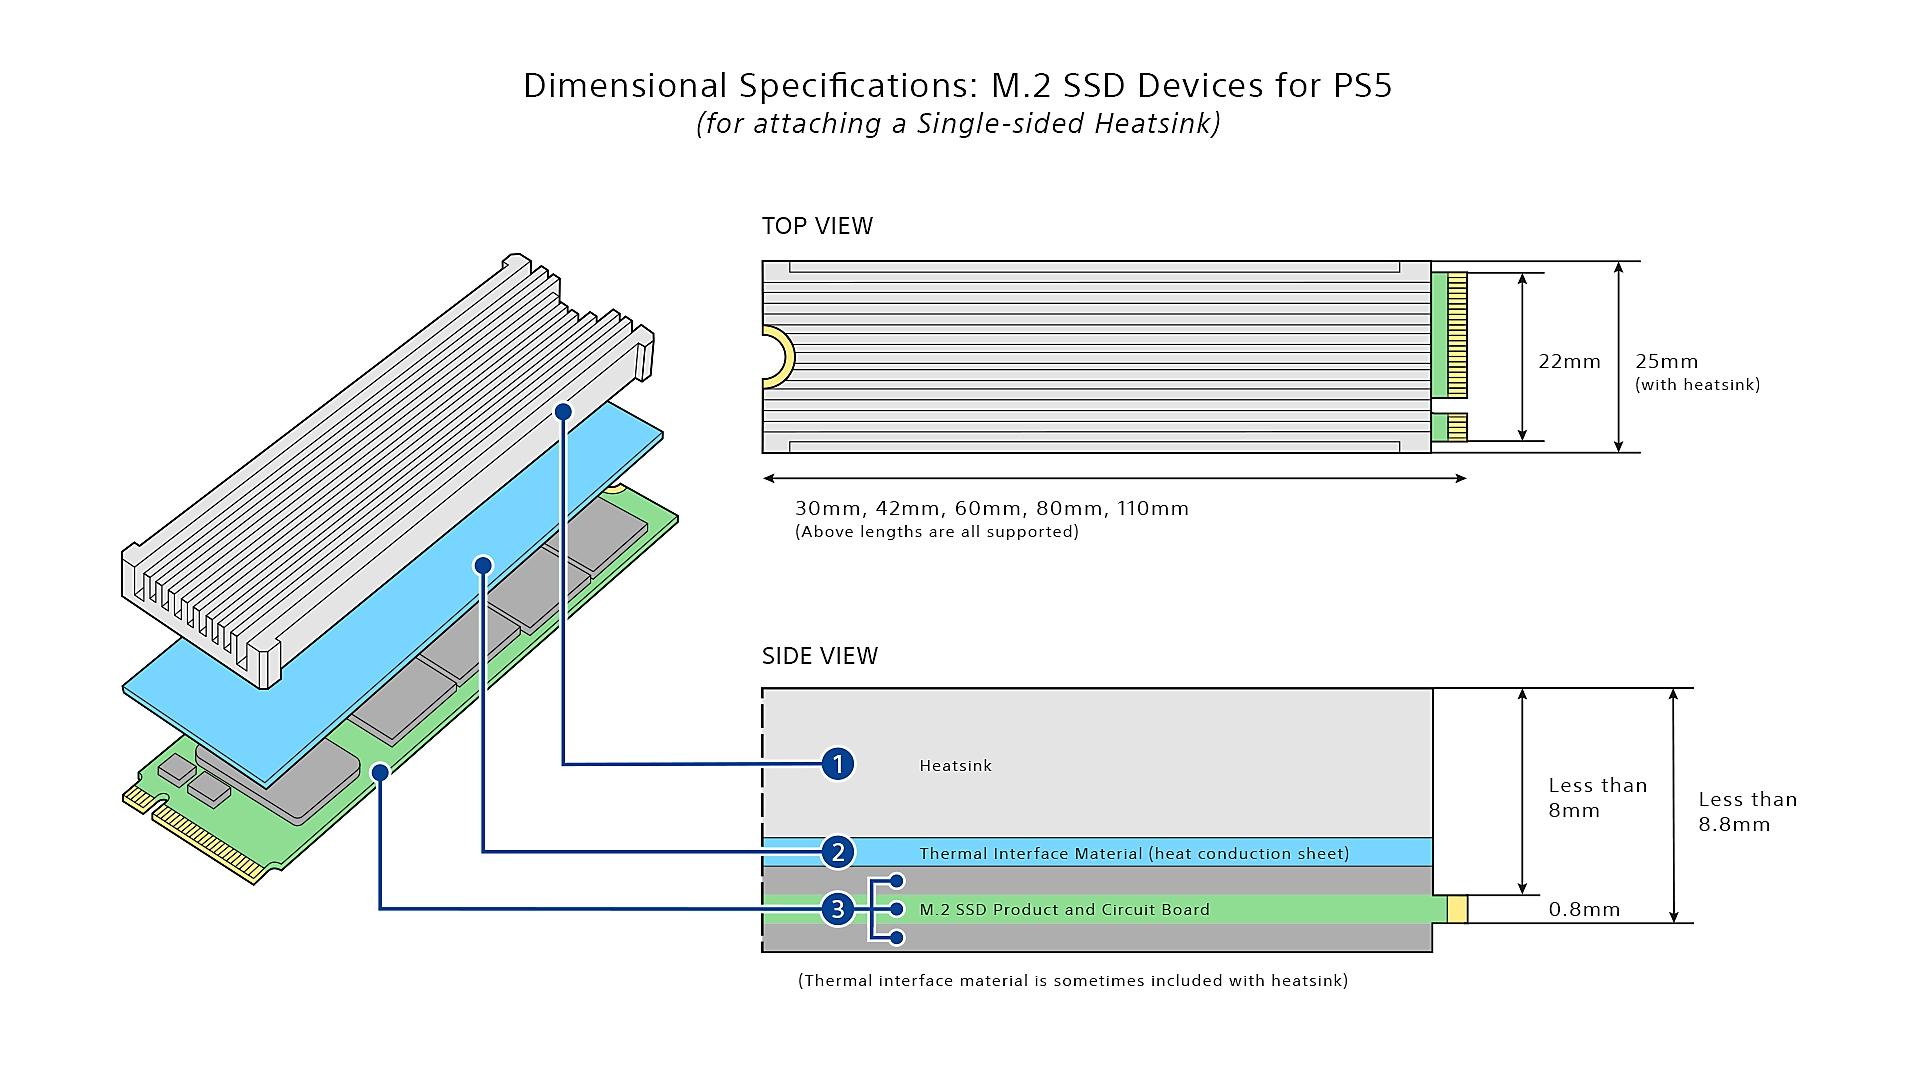 M.2 SSD met één koeler